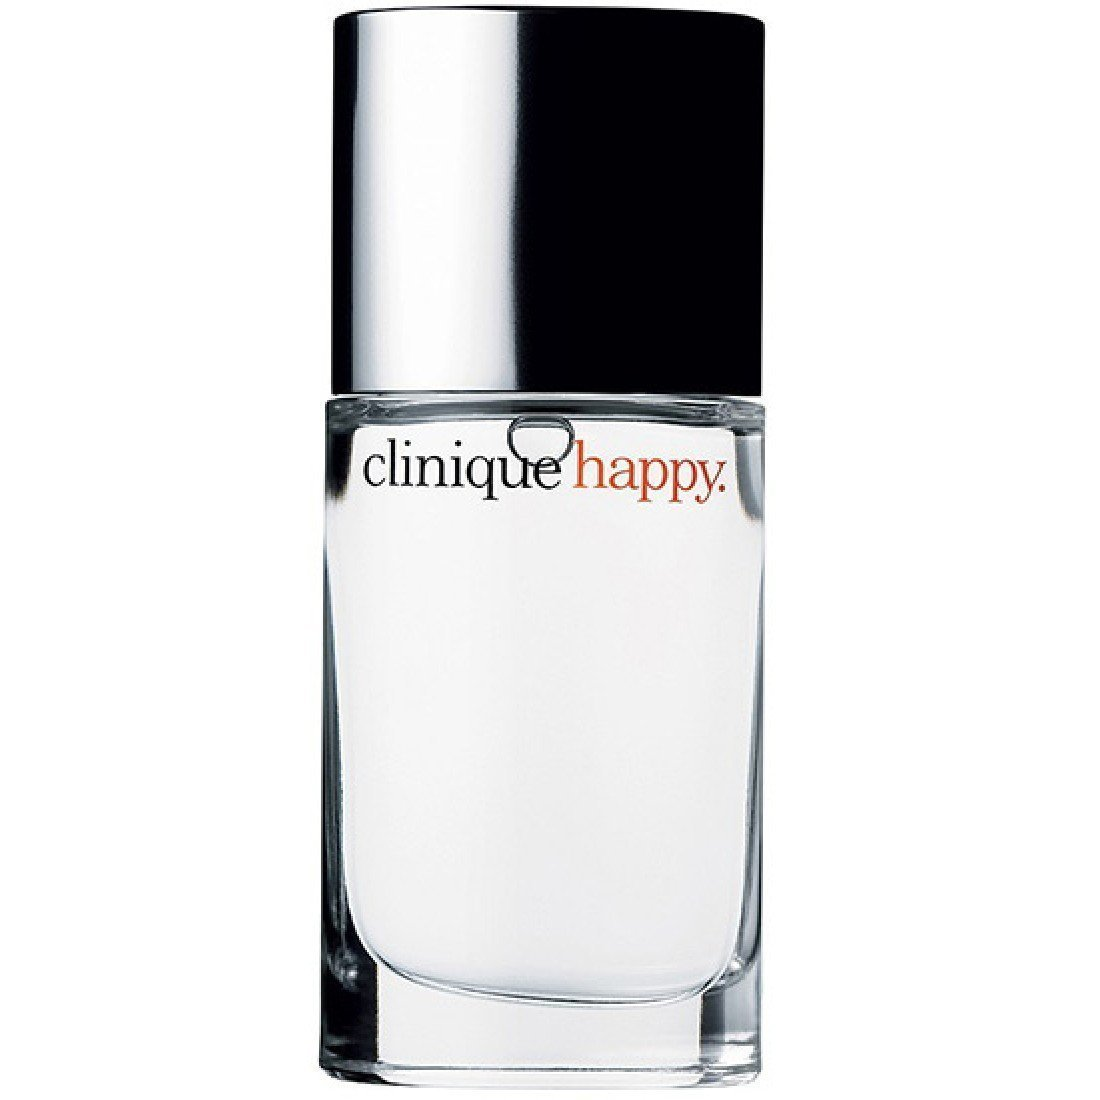 Clinique - Happy for Women 30 ml. EDP